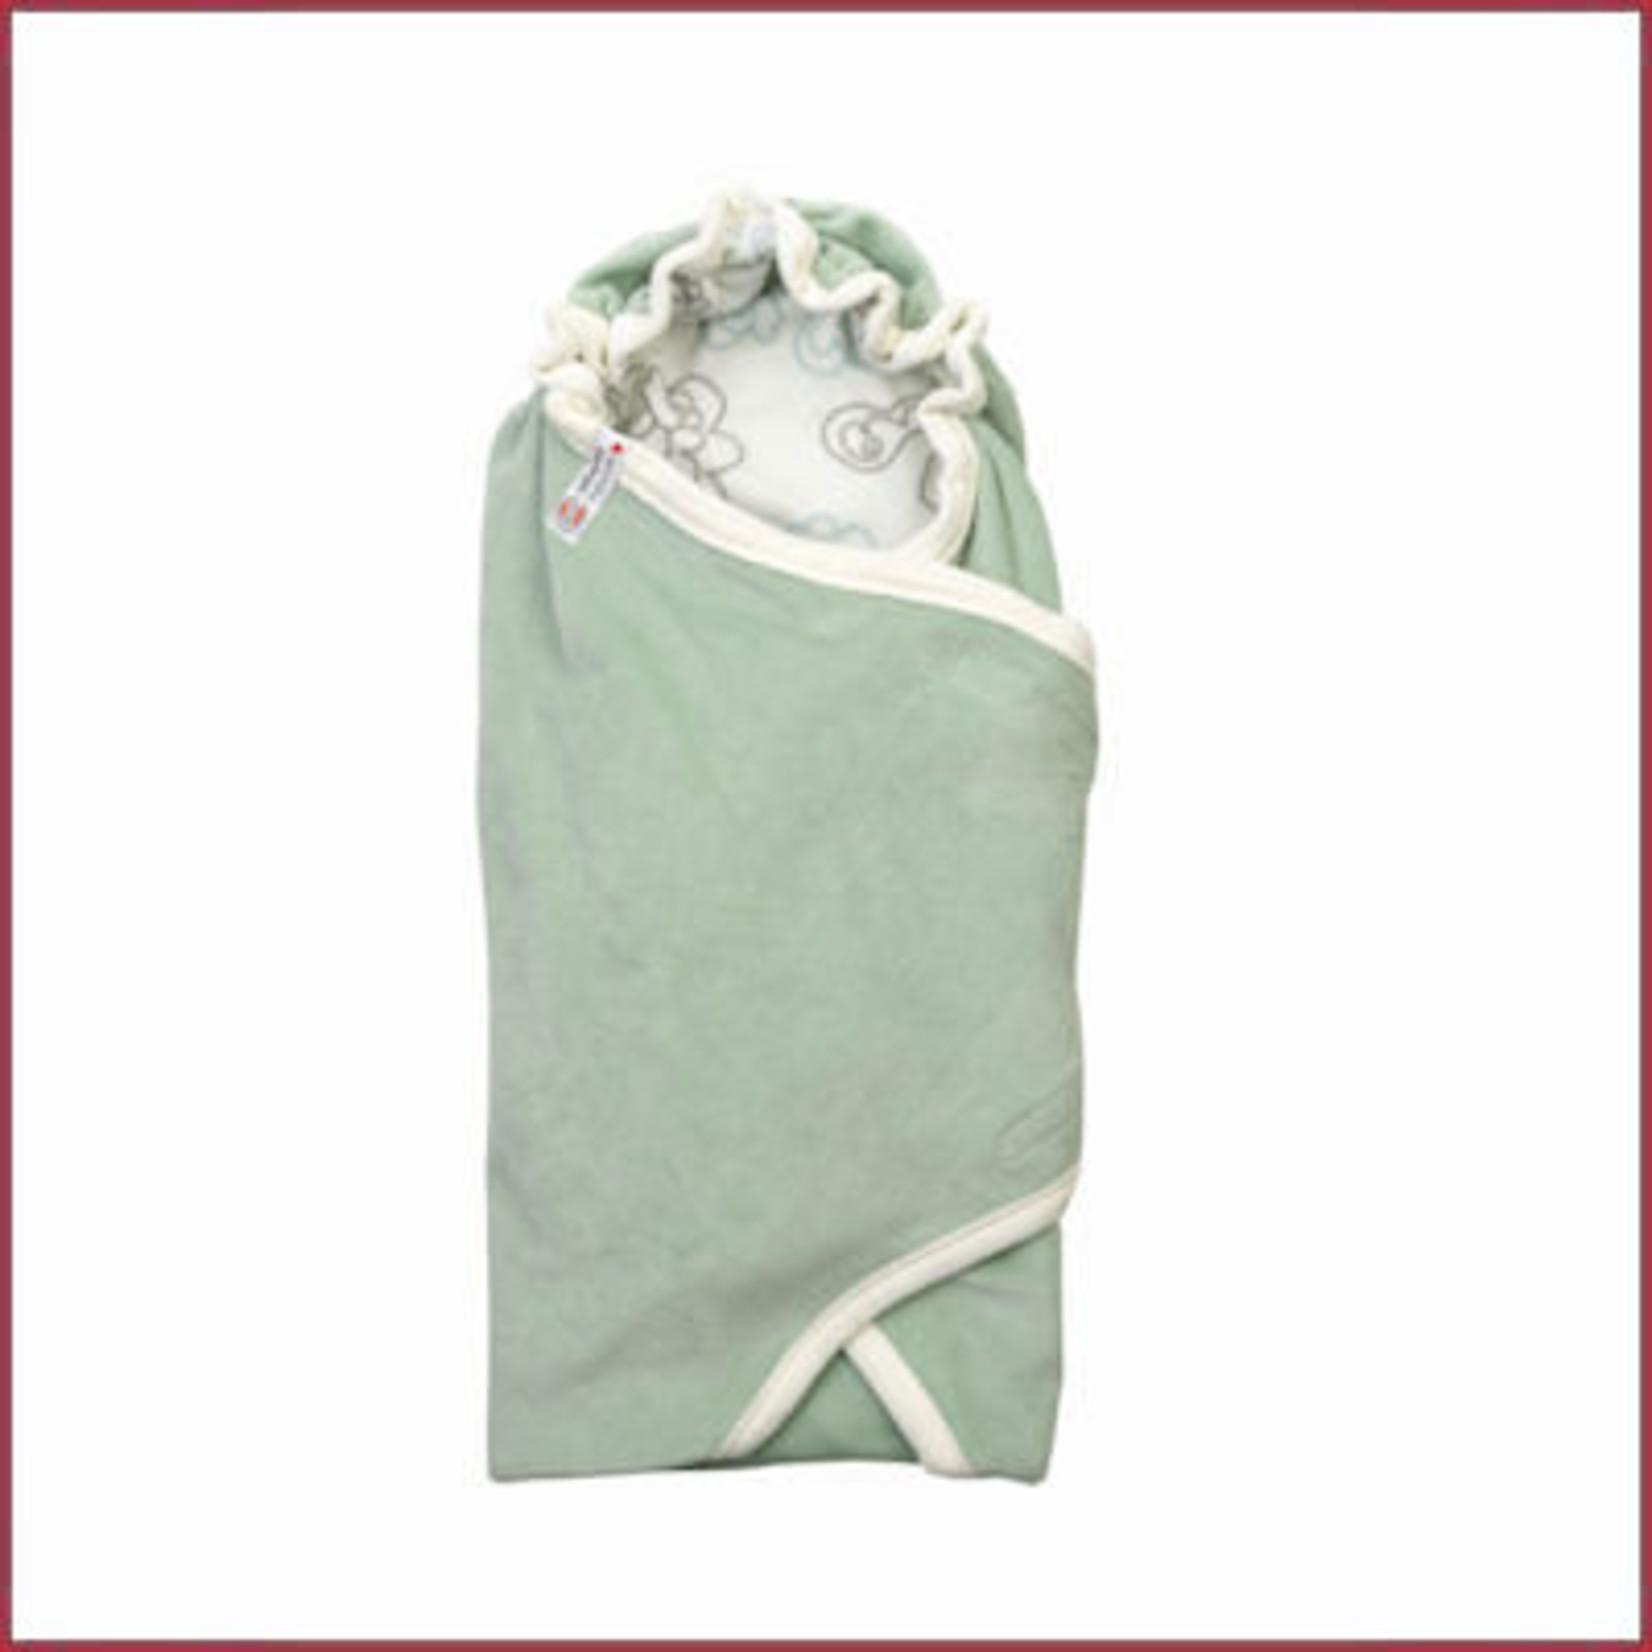 Lodger Inwikkeldoek Wrapper Newborn Empire katoen